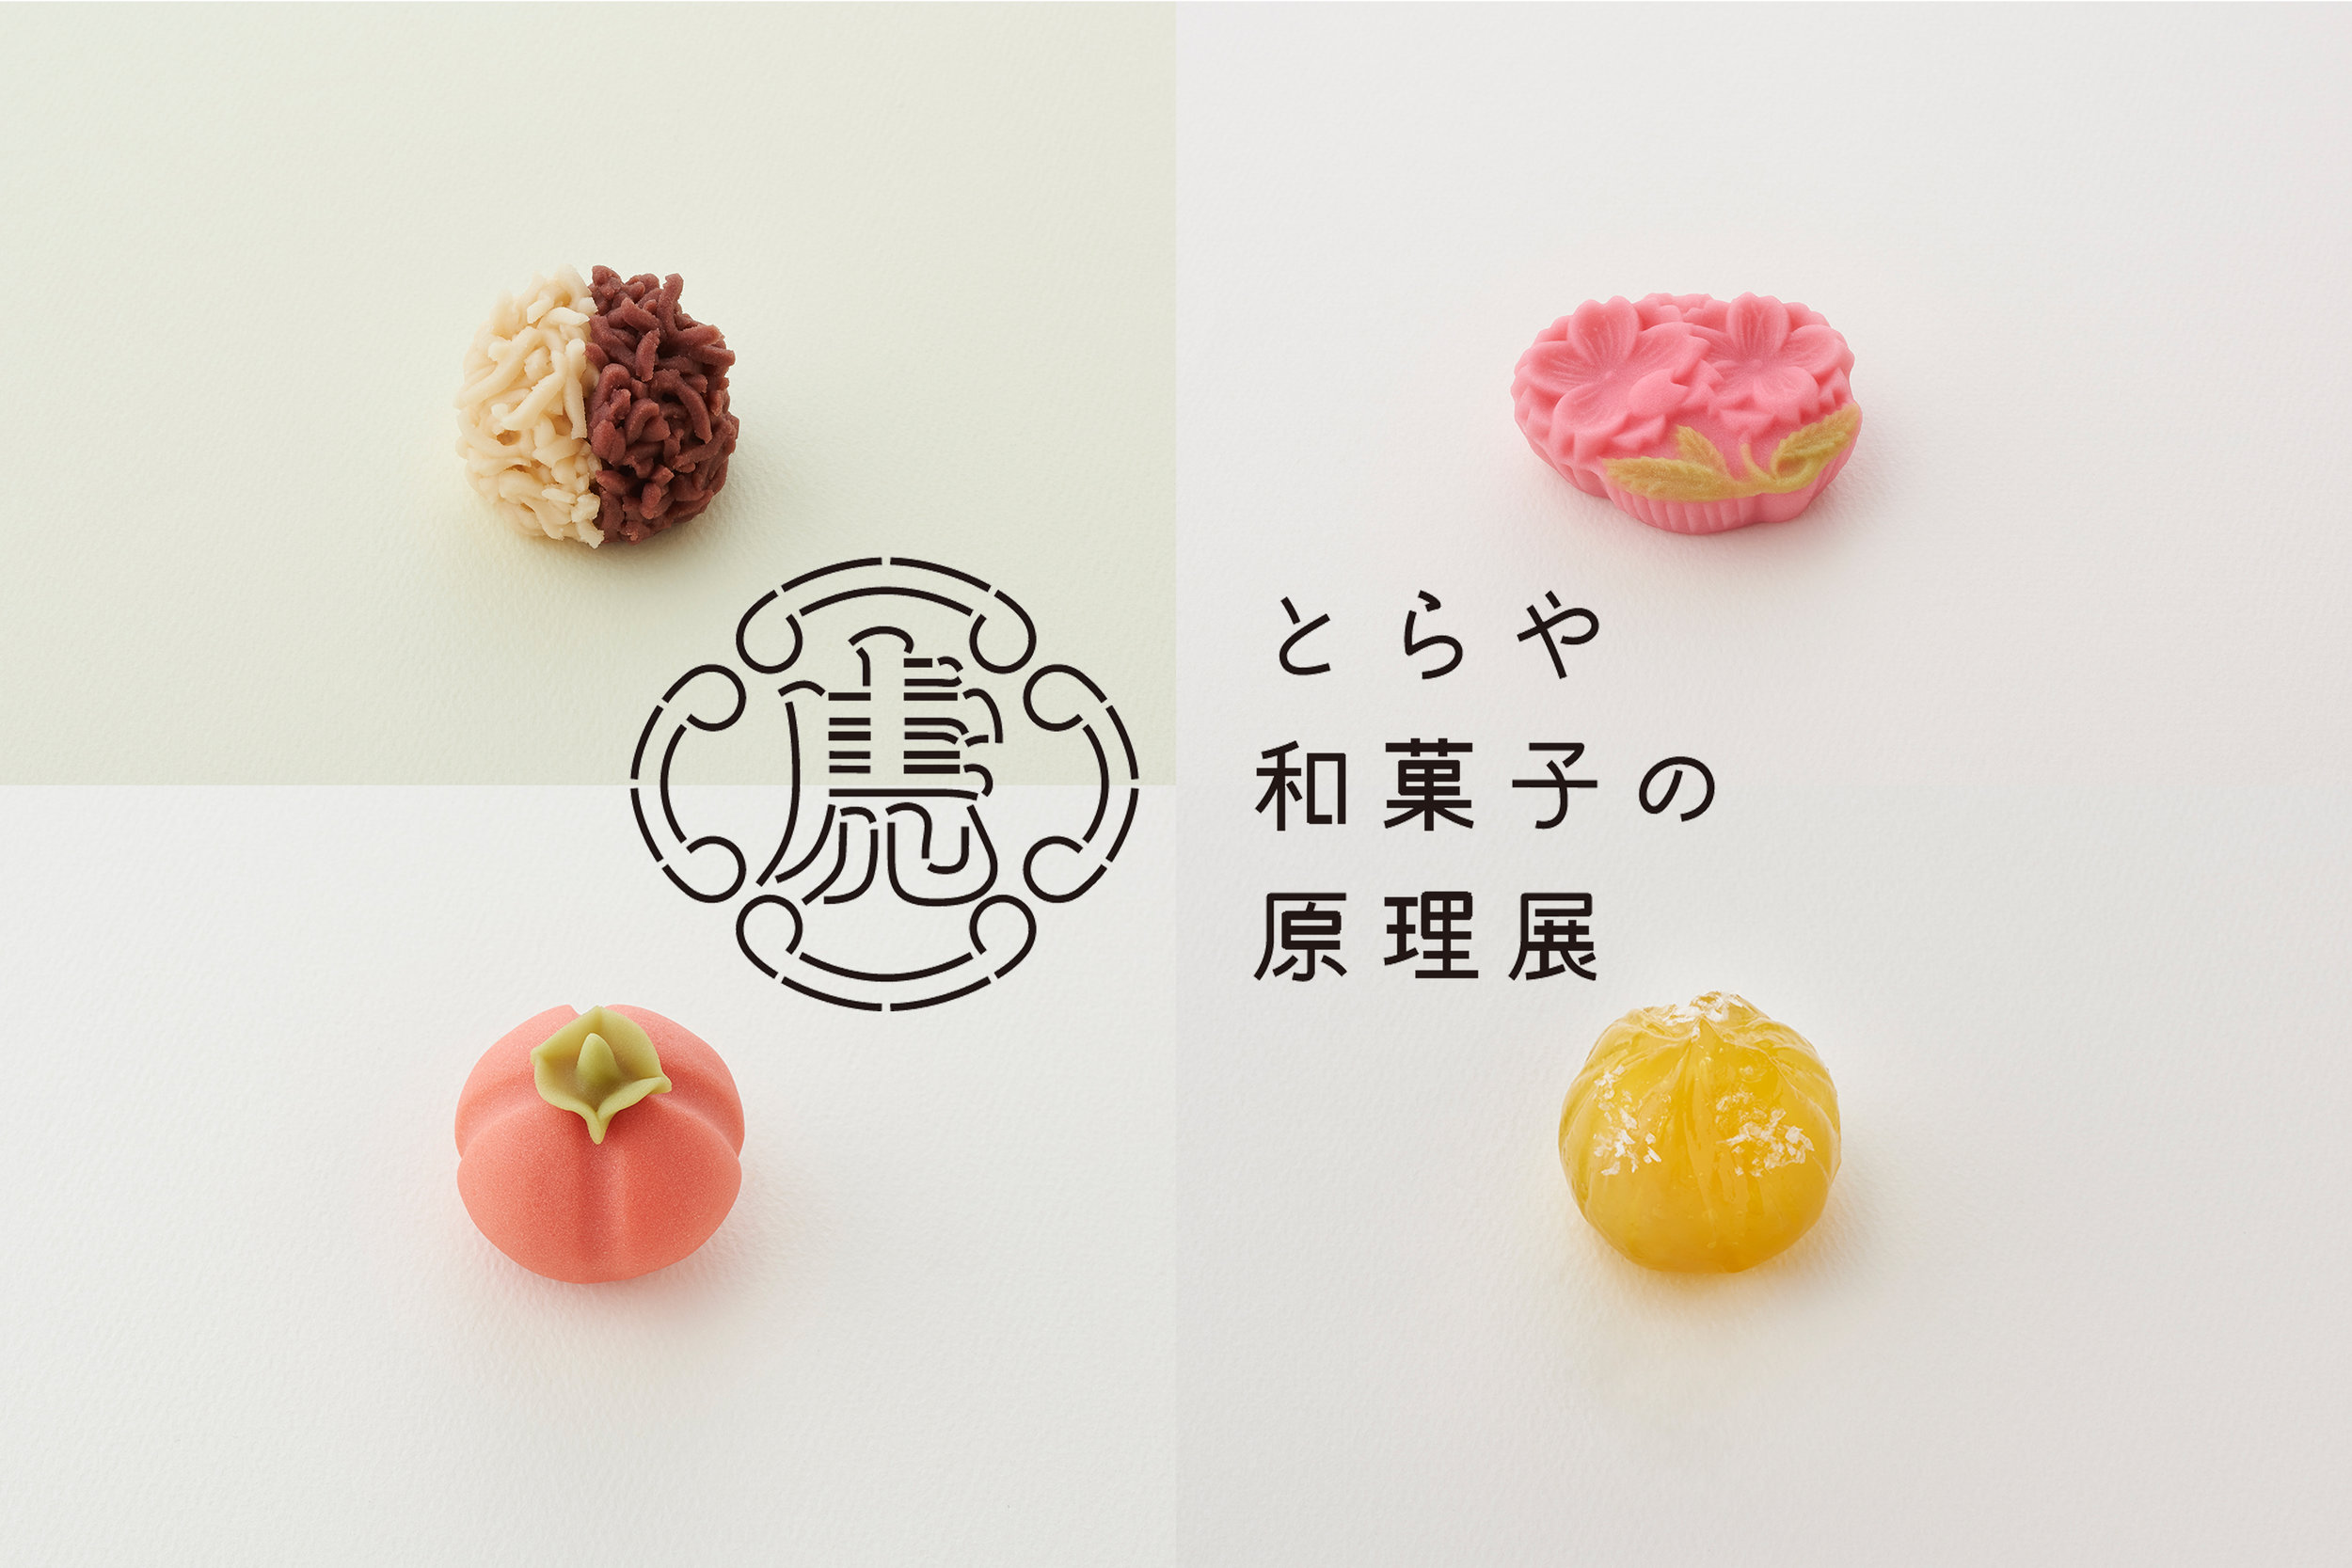 TOKYU PLAZA GINZA X Bunkamura X Toraya Exhibition